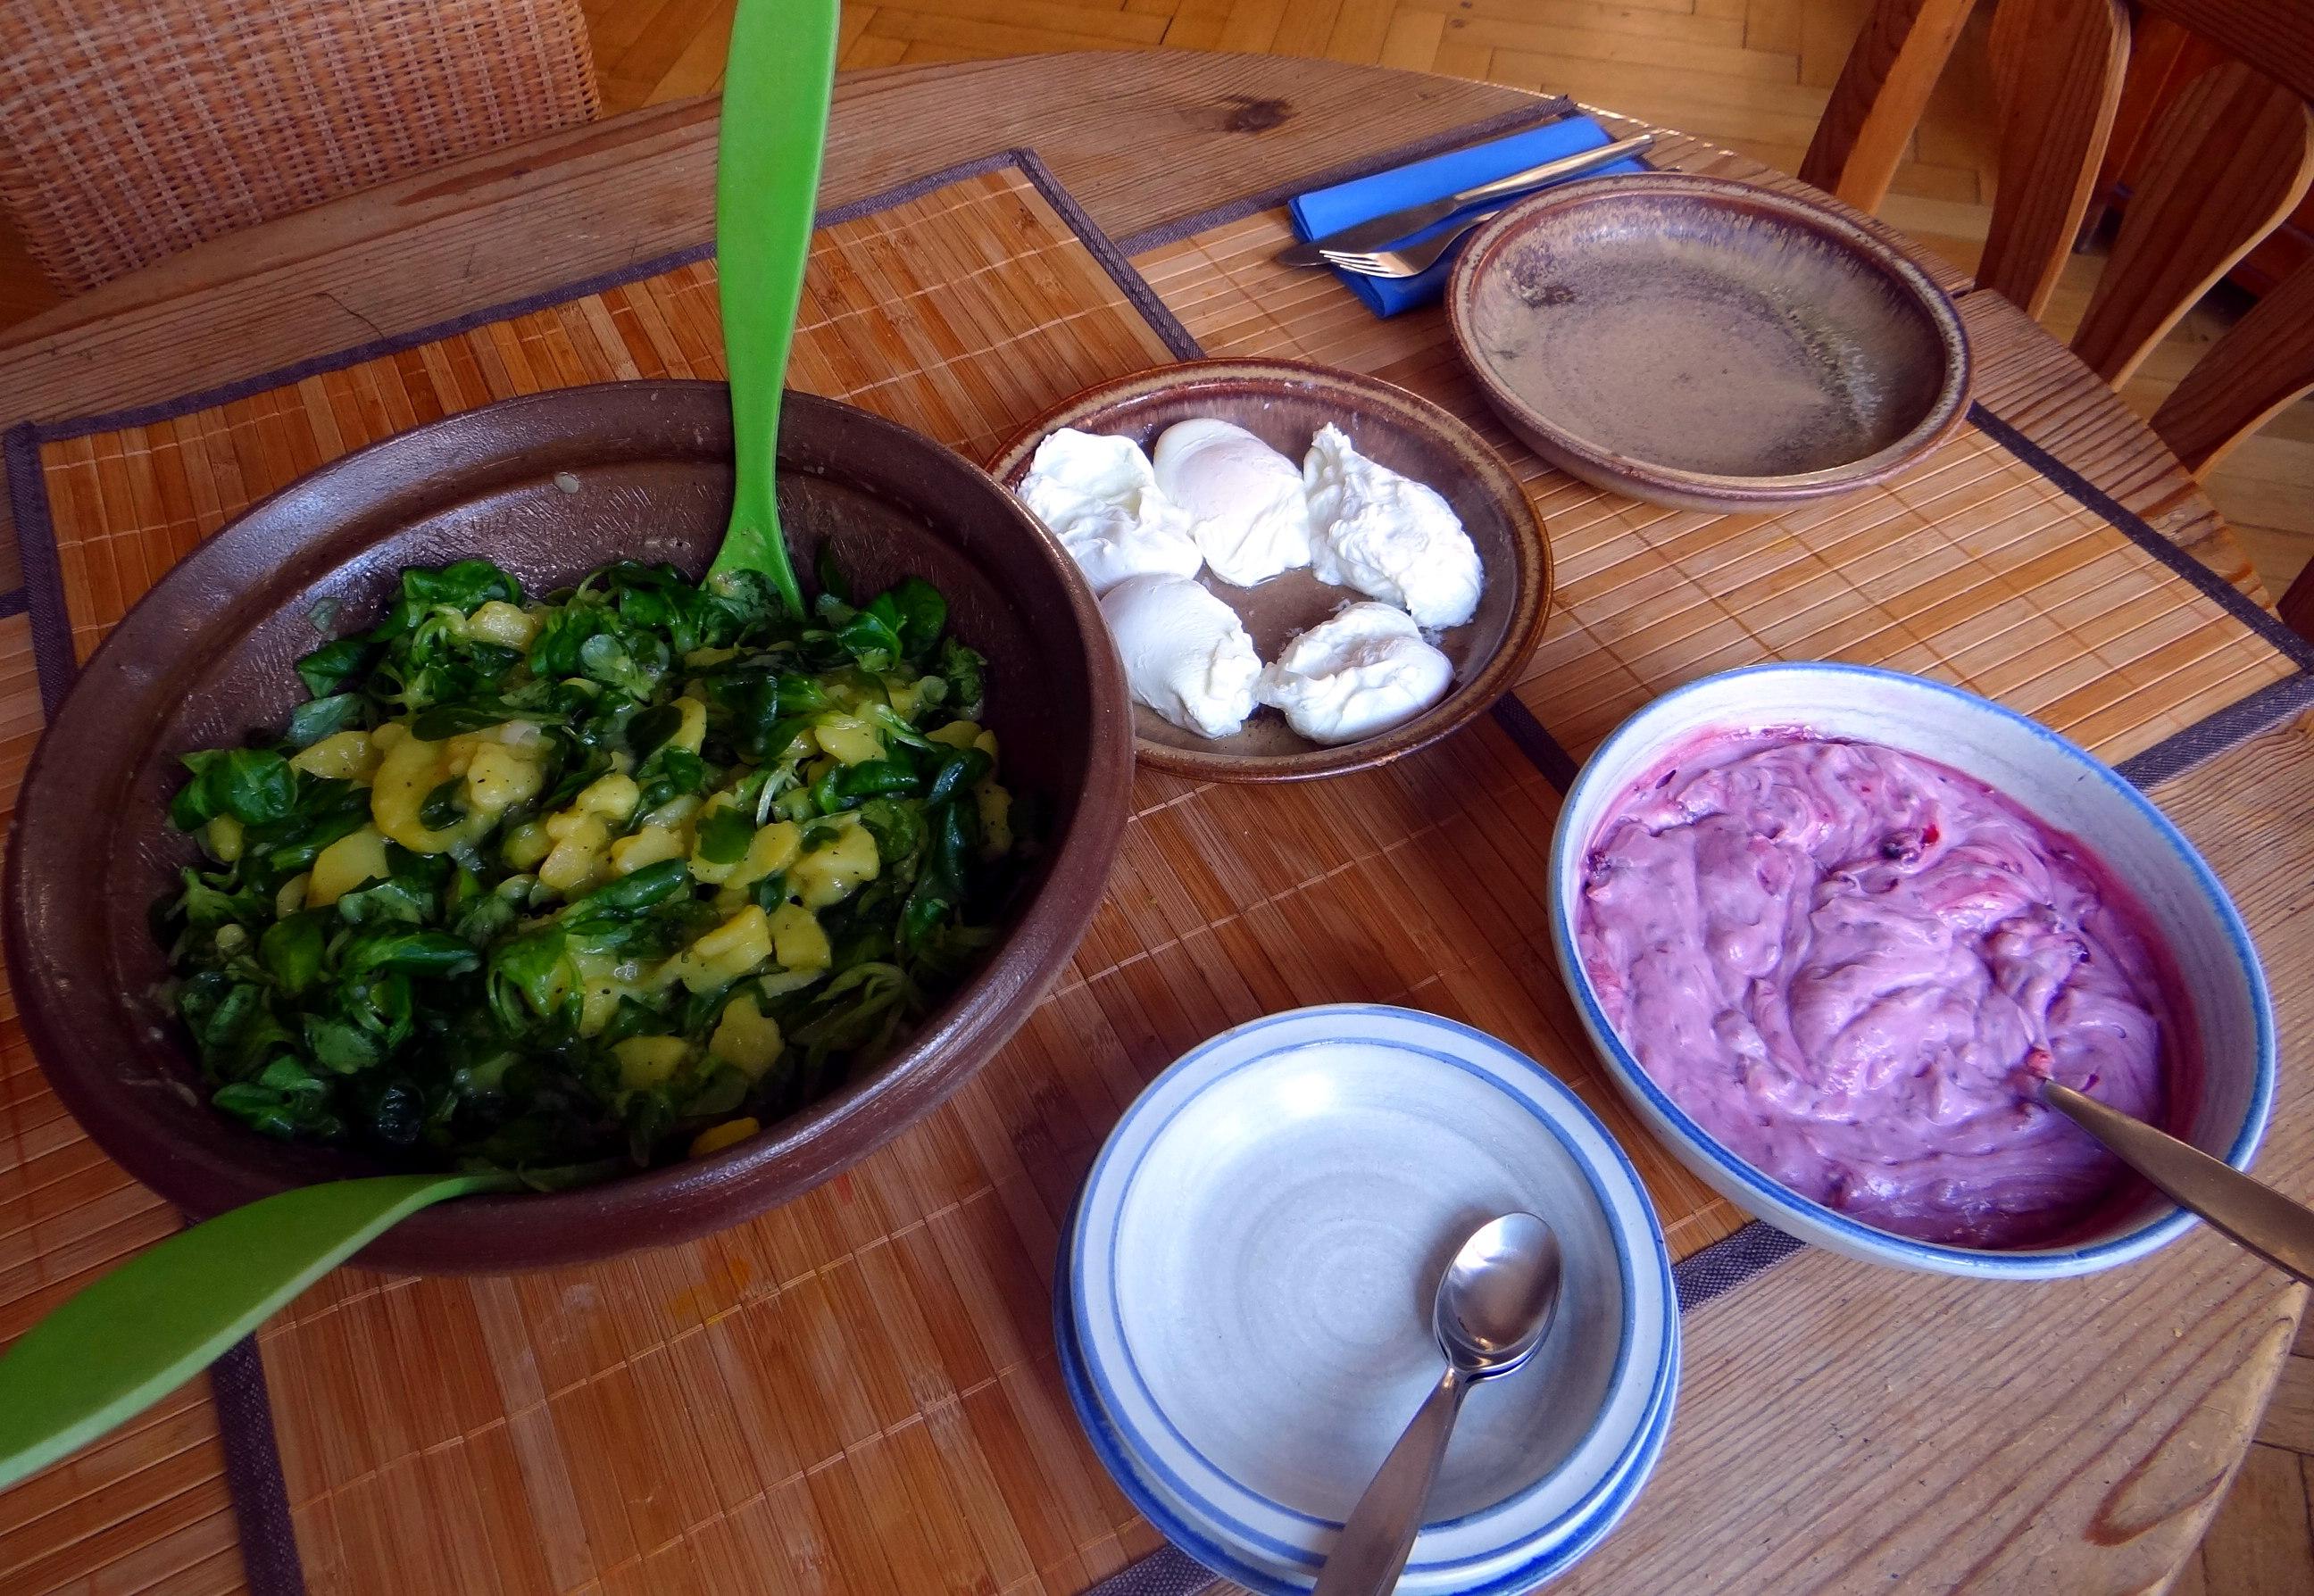 Schlotziger Kartoffelsalat,poschierte Eier,Quarkspeise (5)